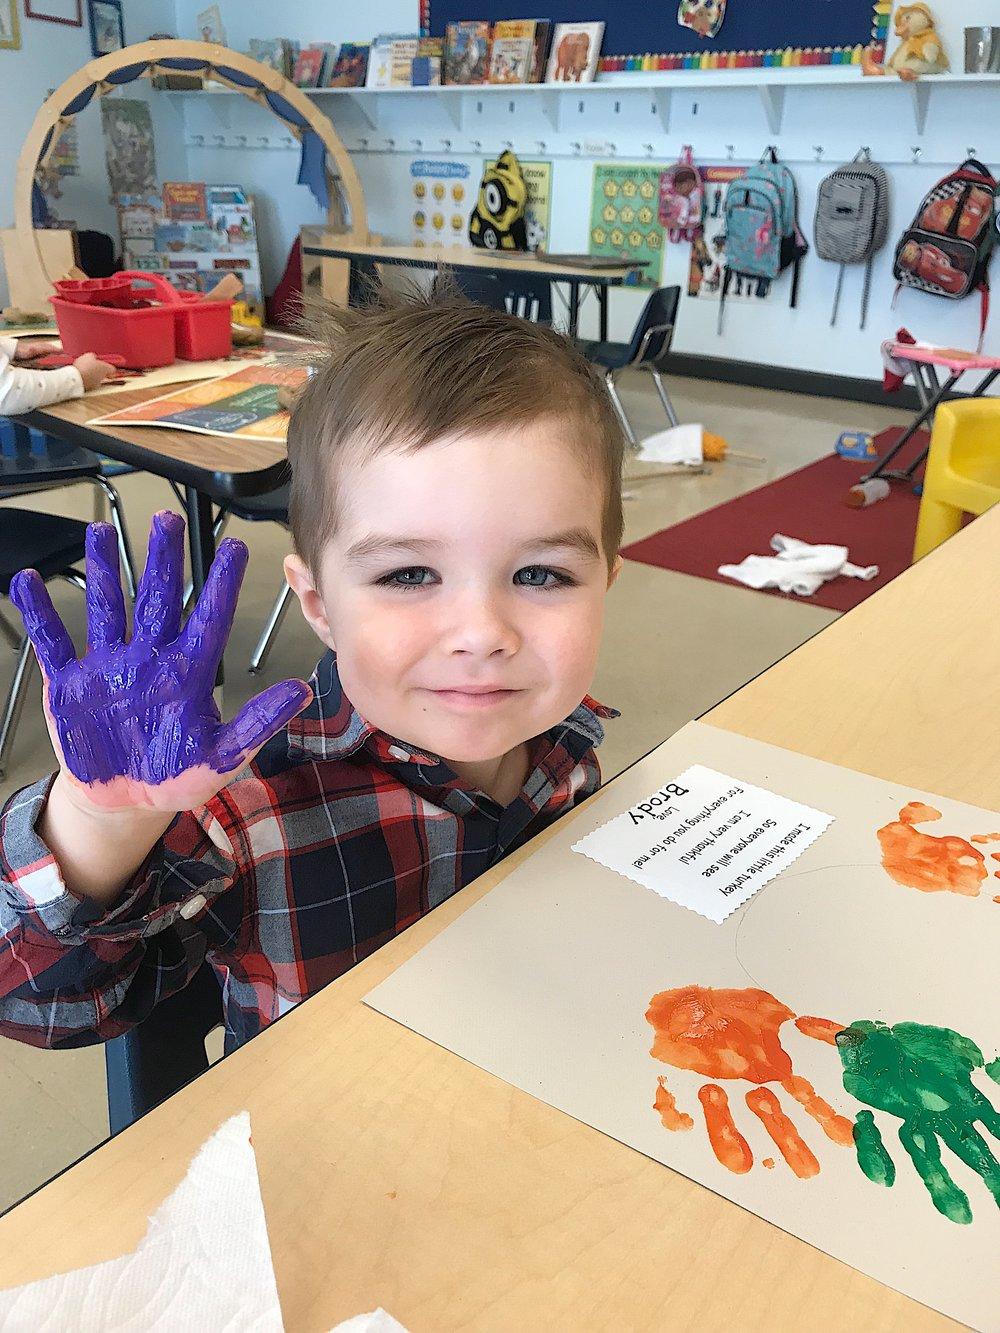 First day of Preschool | Picking a Preschool | Toddler Preschool